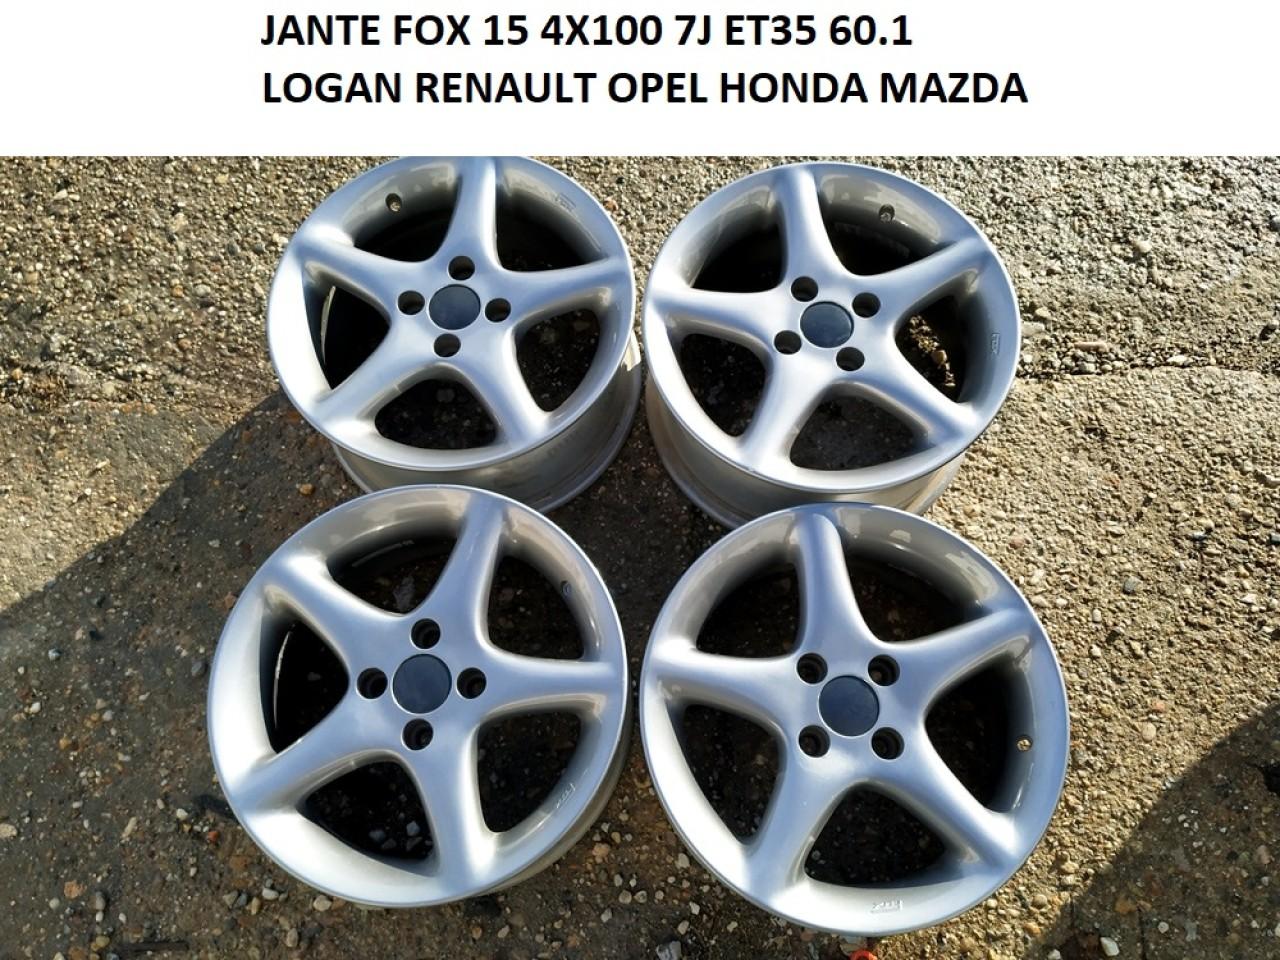 JANTE FOX 15 4X100 LOGAN RENAULT OPEL SI ALTELE